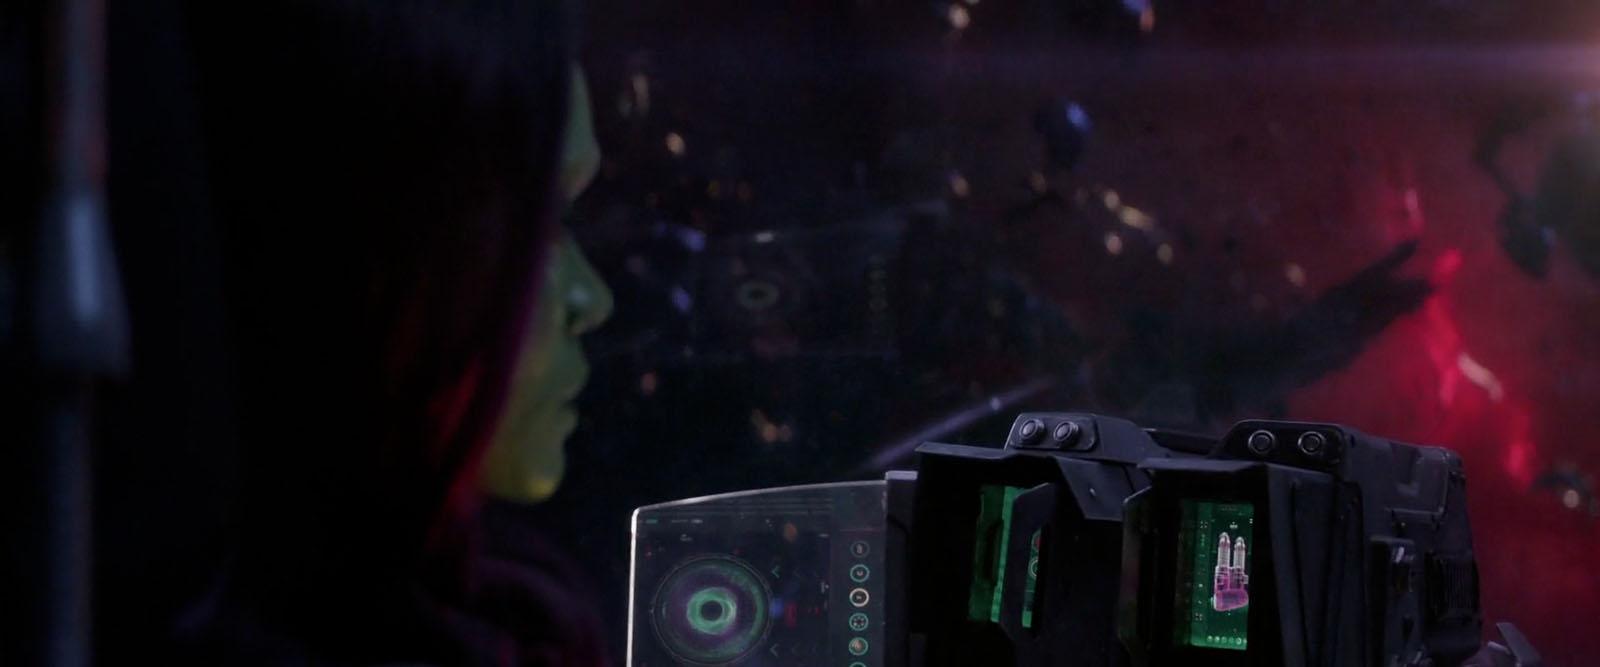 Avengers_IW_Screens_TerritoryStudio_003.jpg